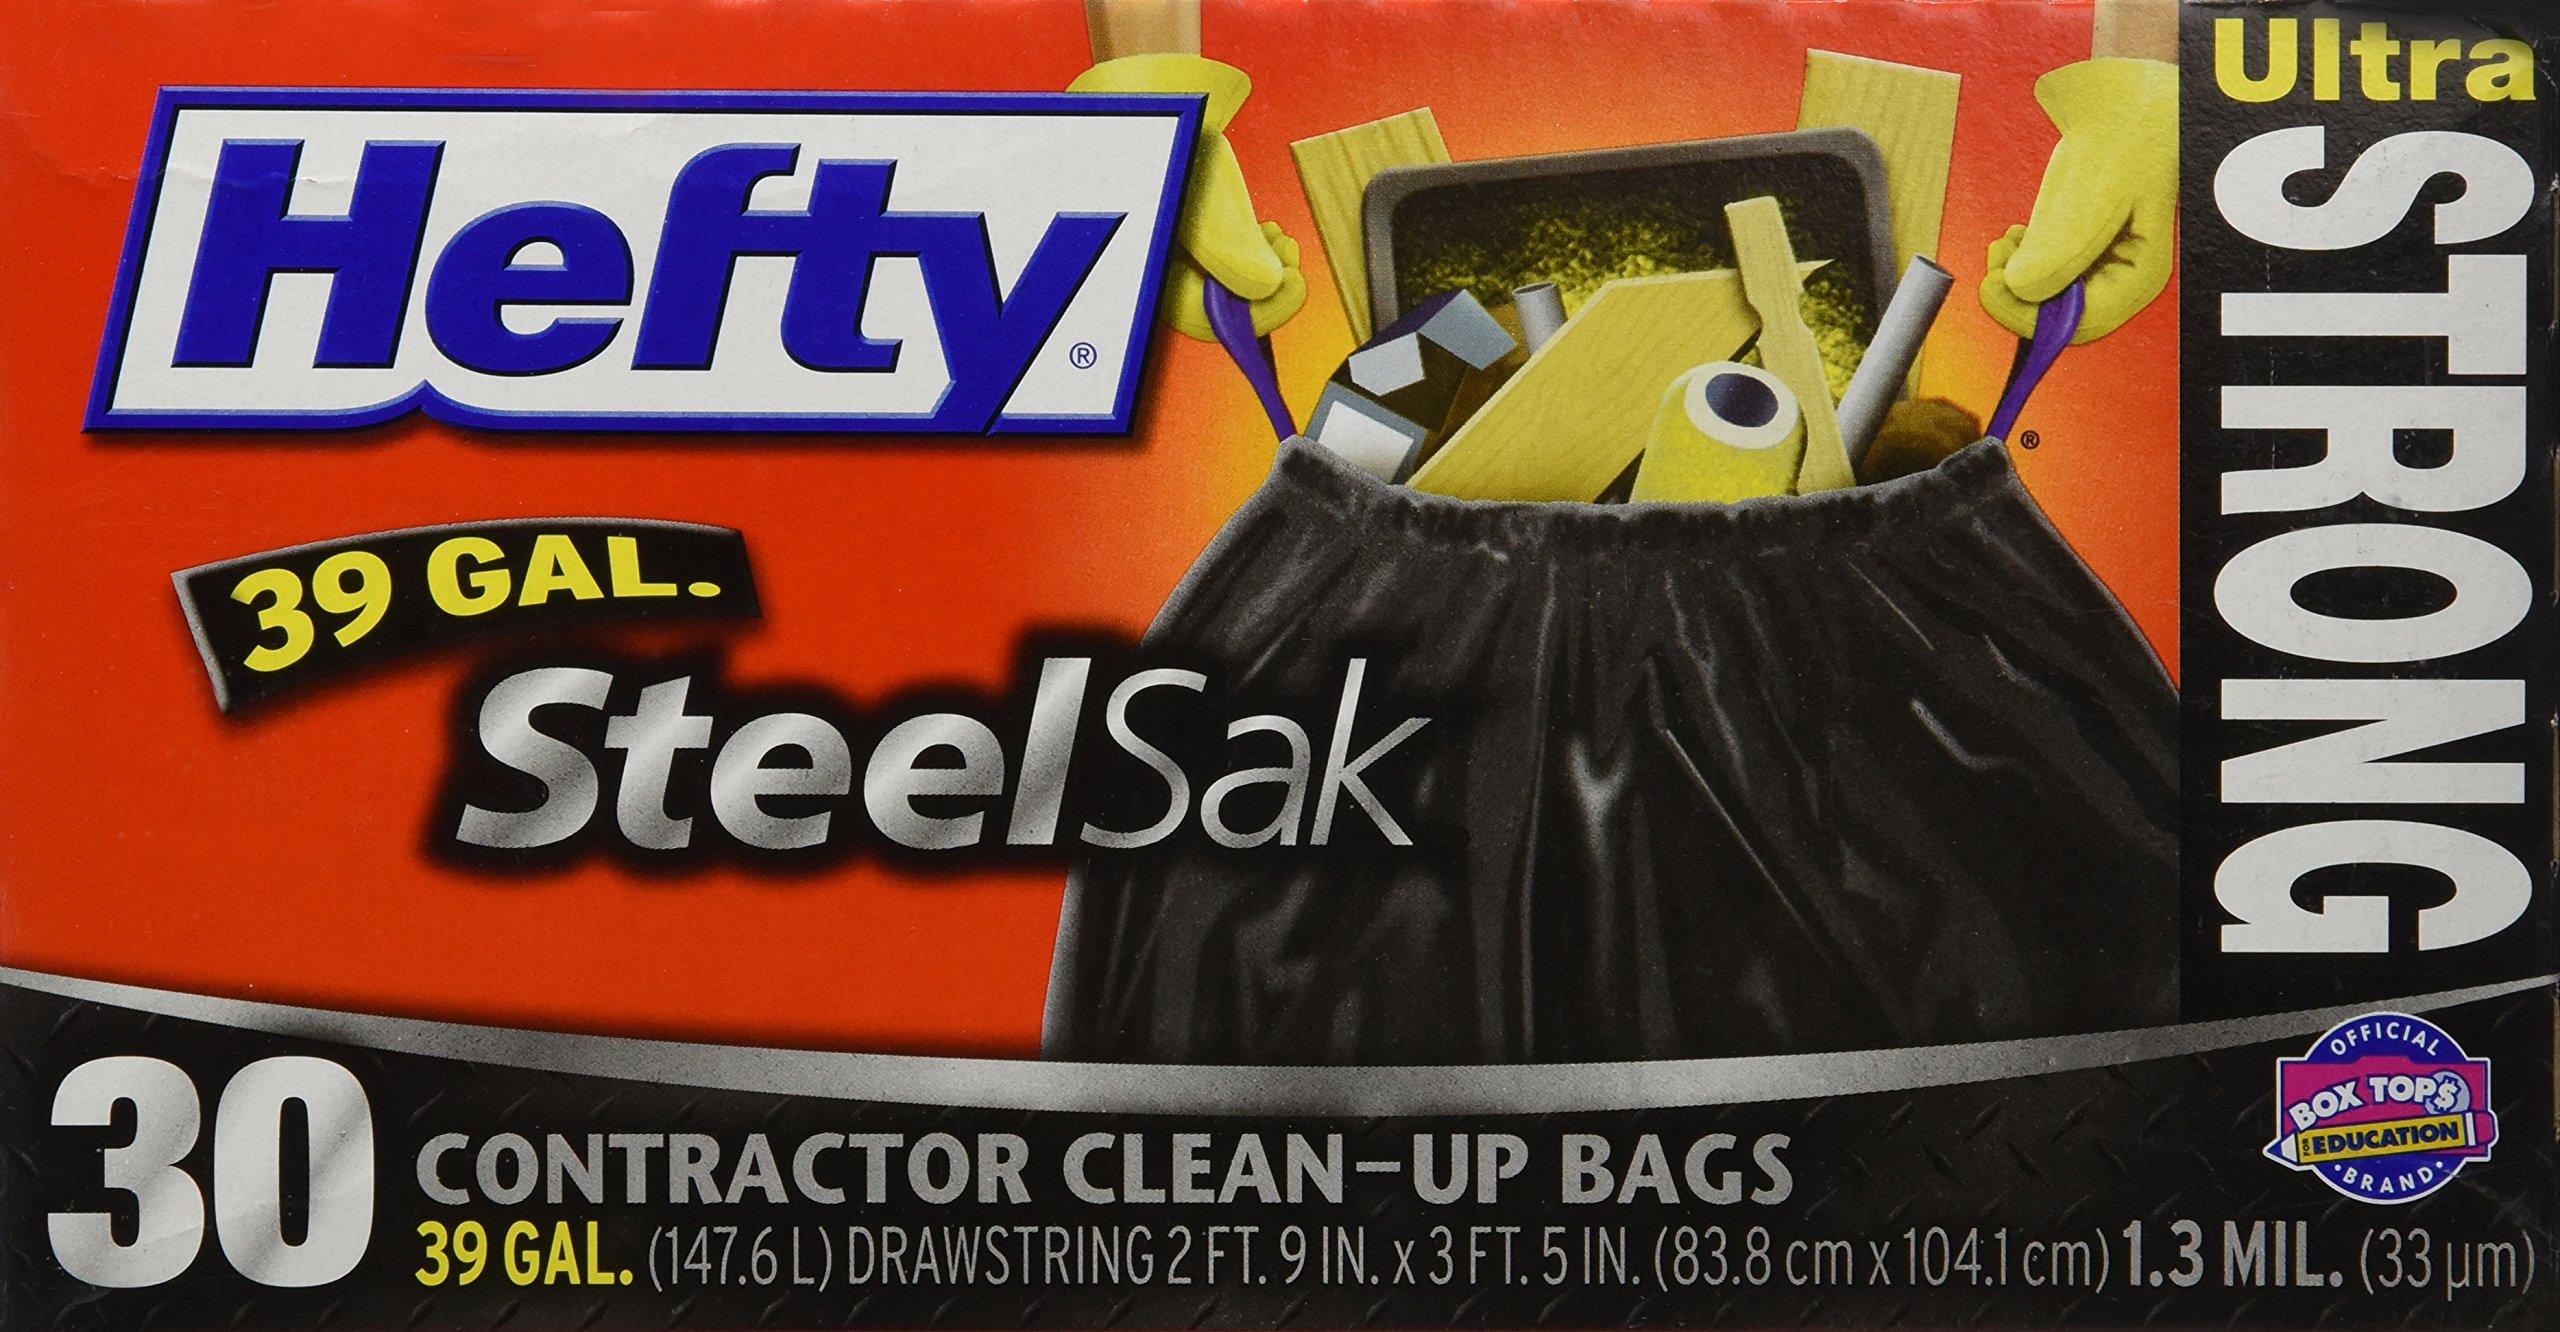 Hefty Trash Bag 39 Gal. 1.3mil Plastic Black - 30 ct. by Hefty